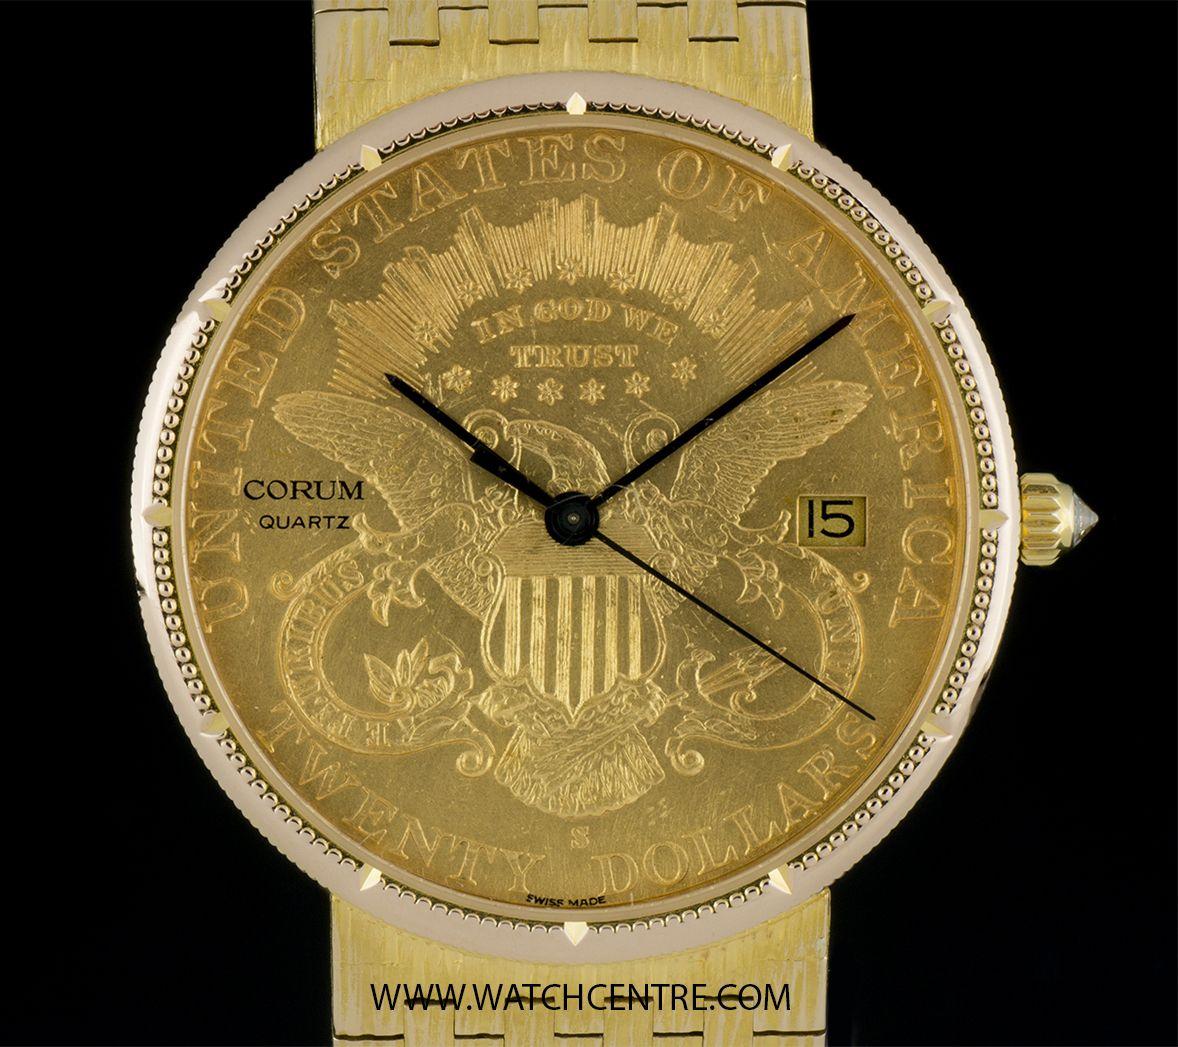 CORUM 18K YELLOW GOLD USA TWENTY DOLLAR COIN QUARTZ GENTS WRISTWATCH  http://www.watchcentre.com/product/corum-18k-yellow-gold-usa%C2%A0twenty-dollar-coin-quartz-gents-wristwatch/7074  #Corum #18kYellowGold #USA #TwentyDollarCoin #Gents #Wristwatch #Luxury #Timepiece #WatchCentre